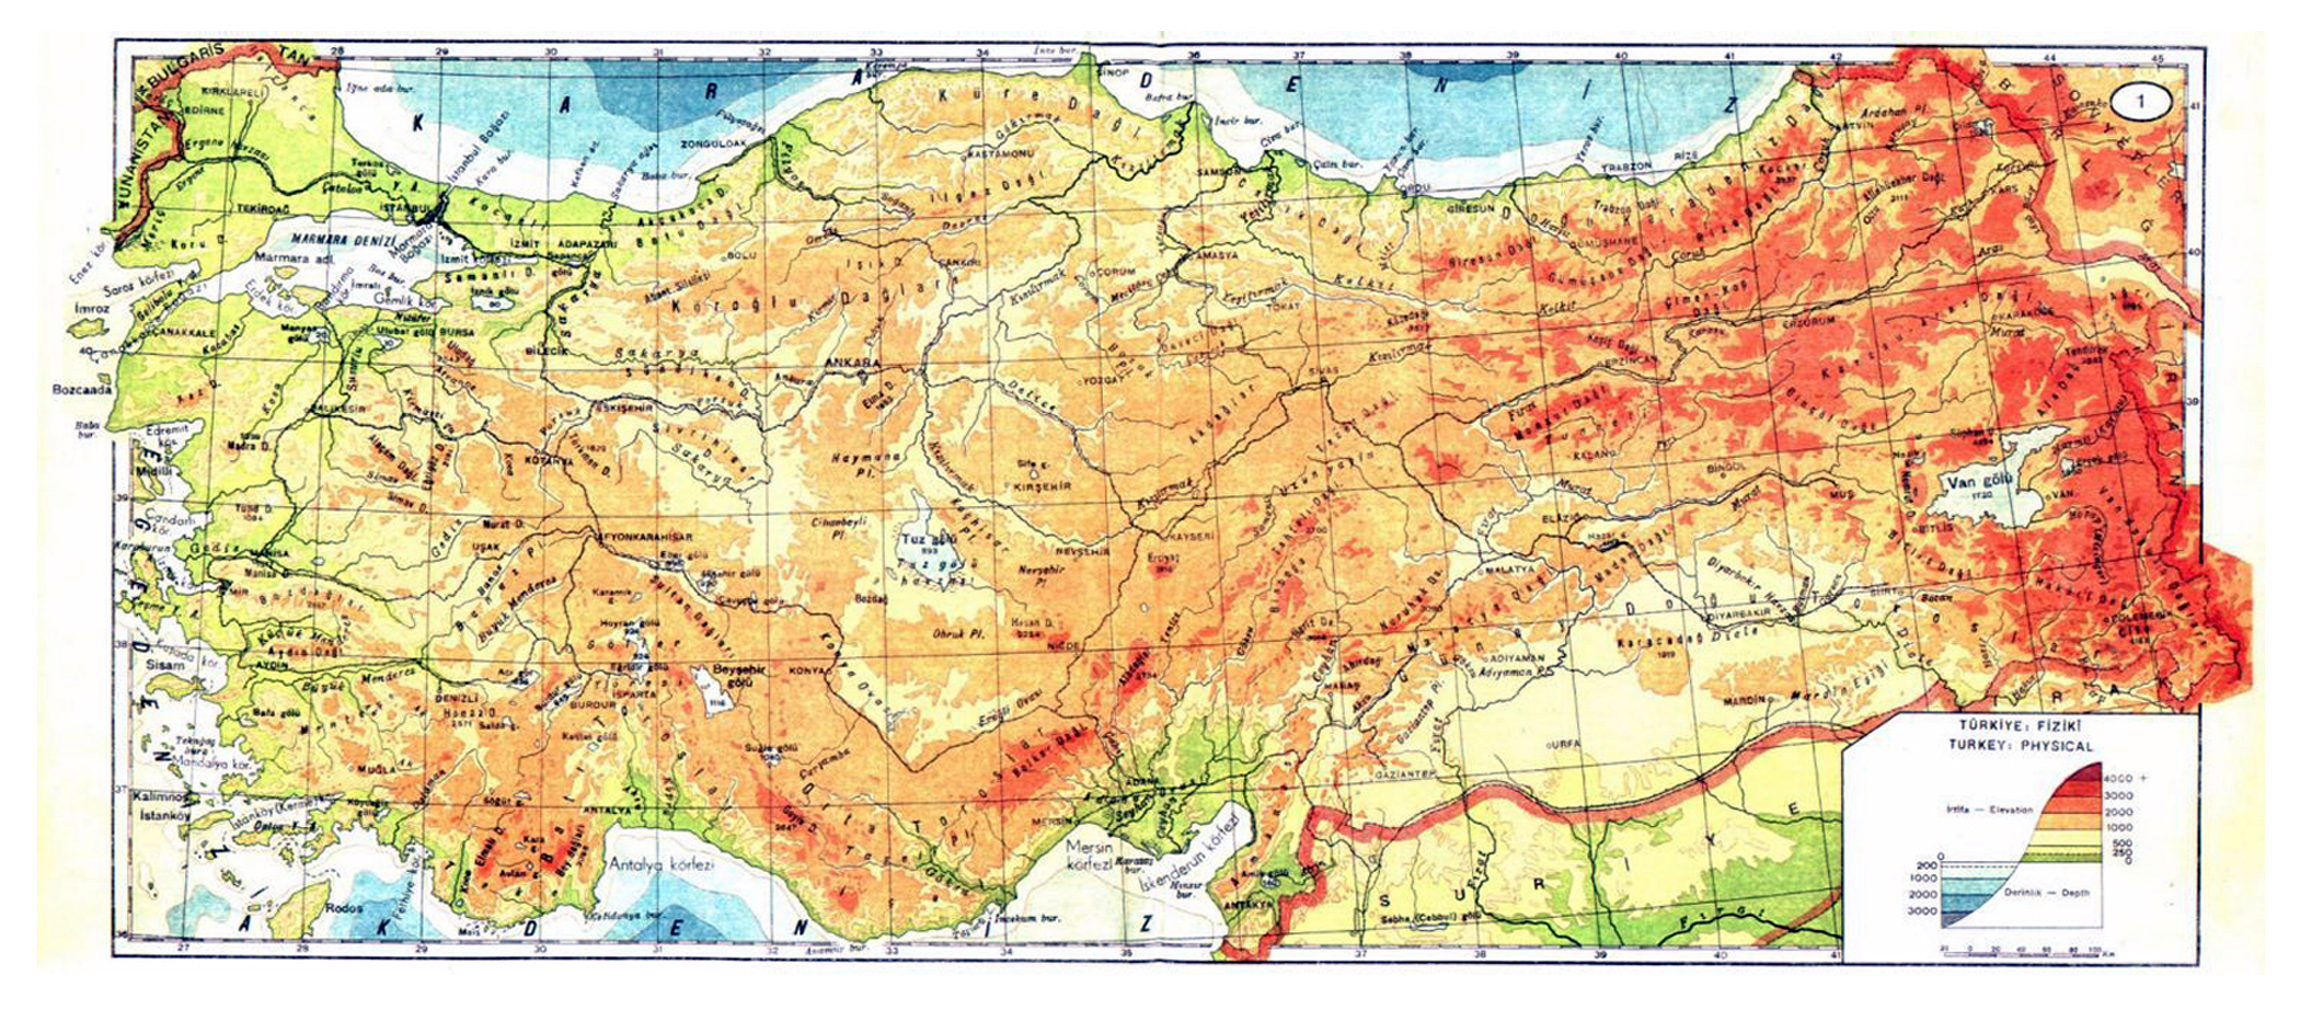 Large physical map of Turkey | Turkey | Asia | Mapsland | Maps of ...